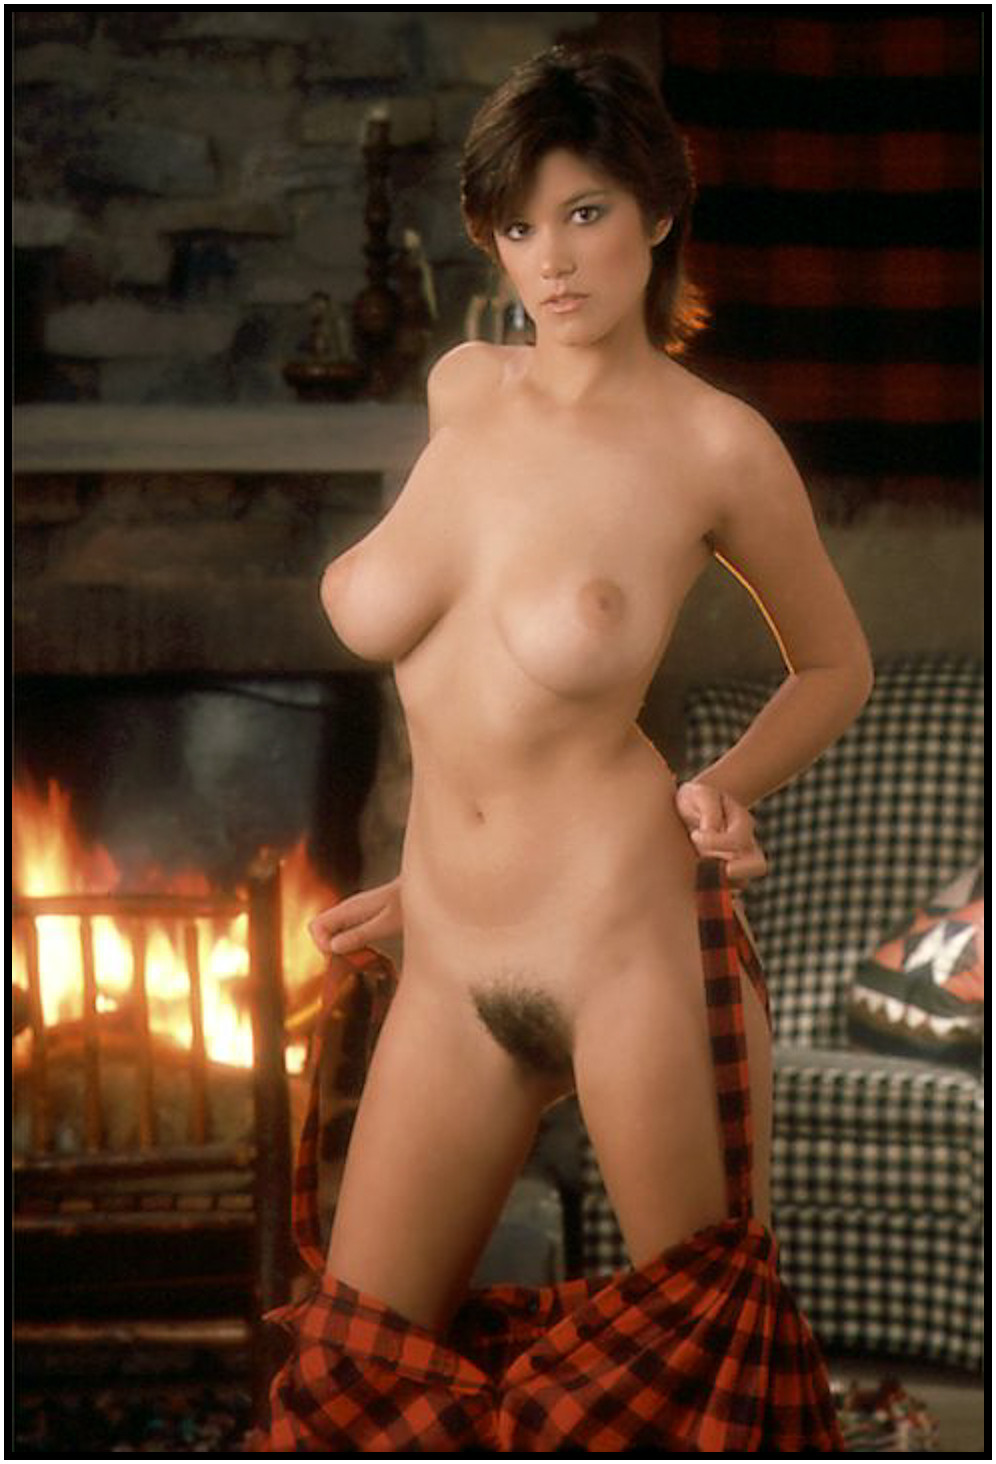 Christine diamond nude pictures